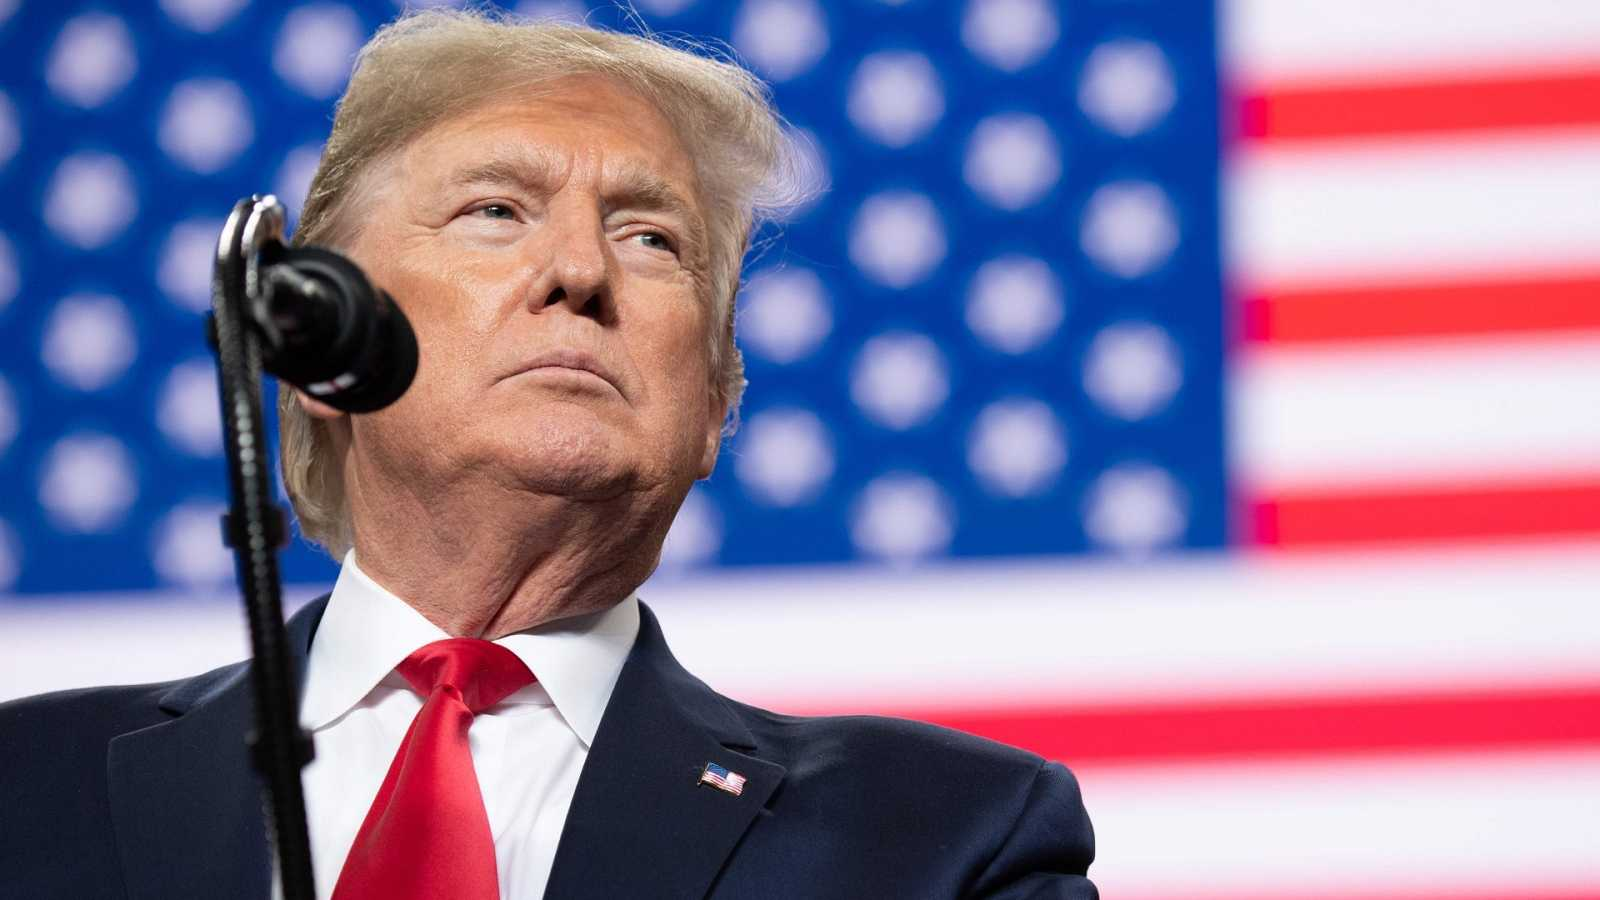 Donald Trump reveló que tomaba hidroxicloroquina de forma preventiva